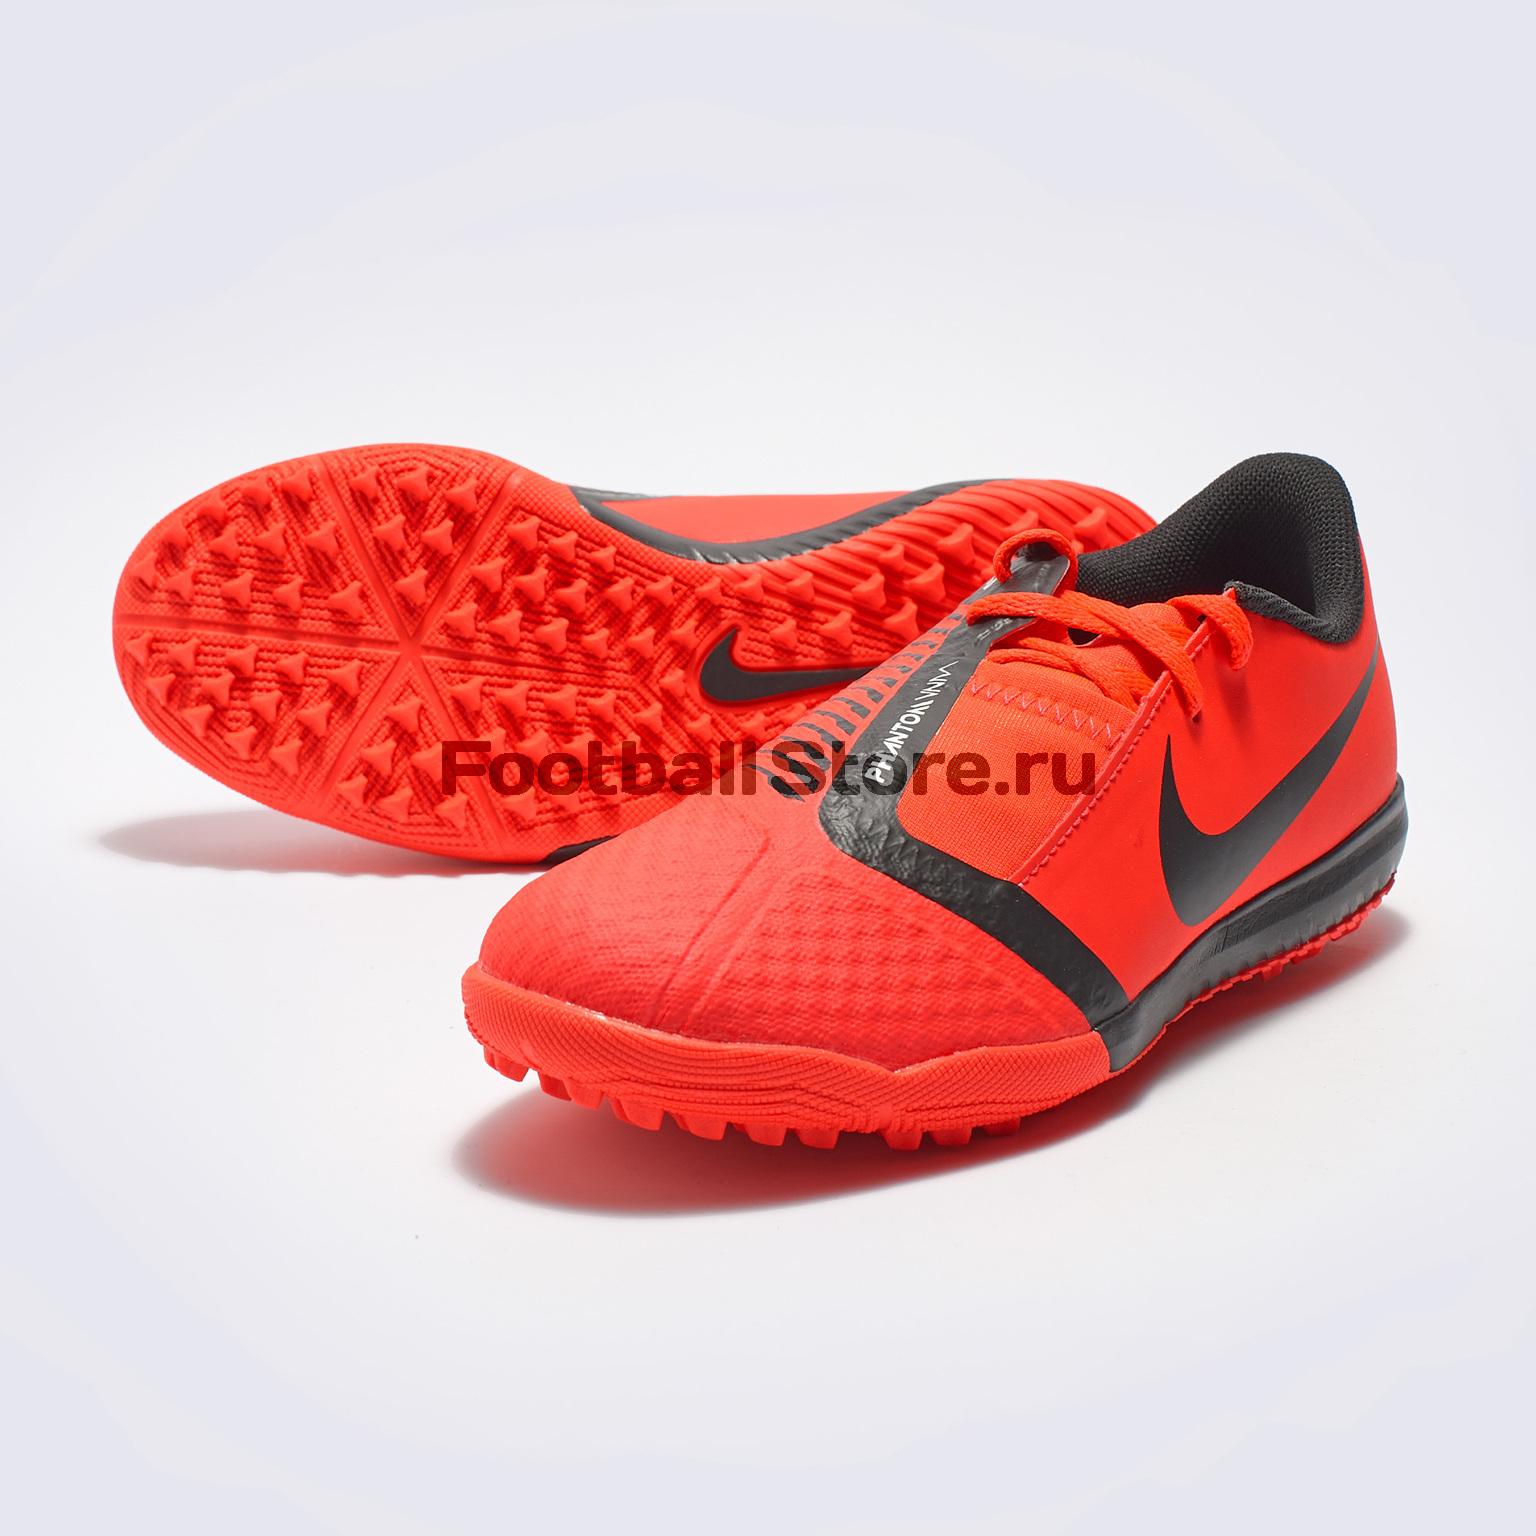 Шиповки детские Nike Phantom Venom Academy TF AO0377-600 шиповки nike elastico finale iii tf 685358 480 8 5 синий